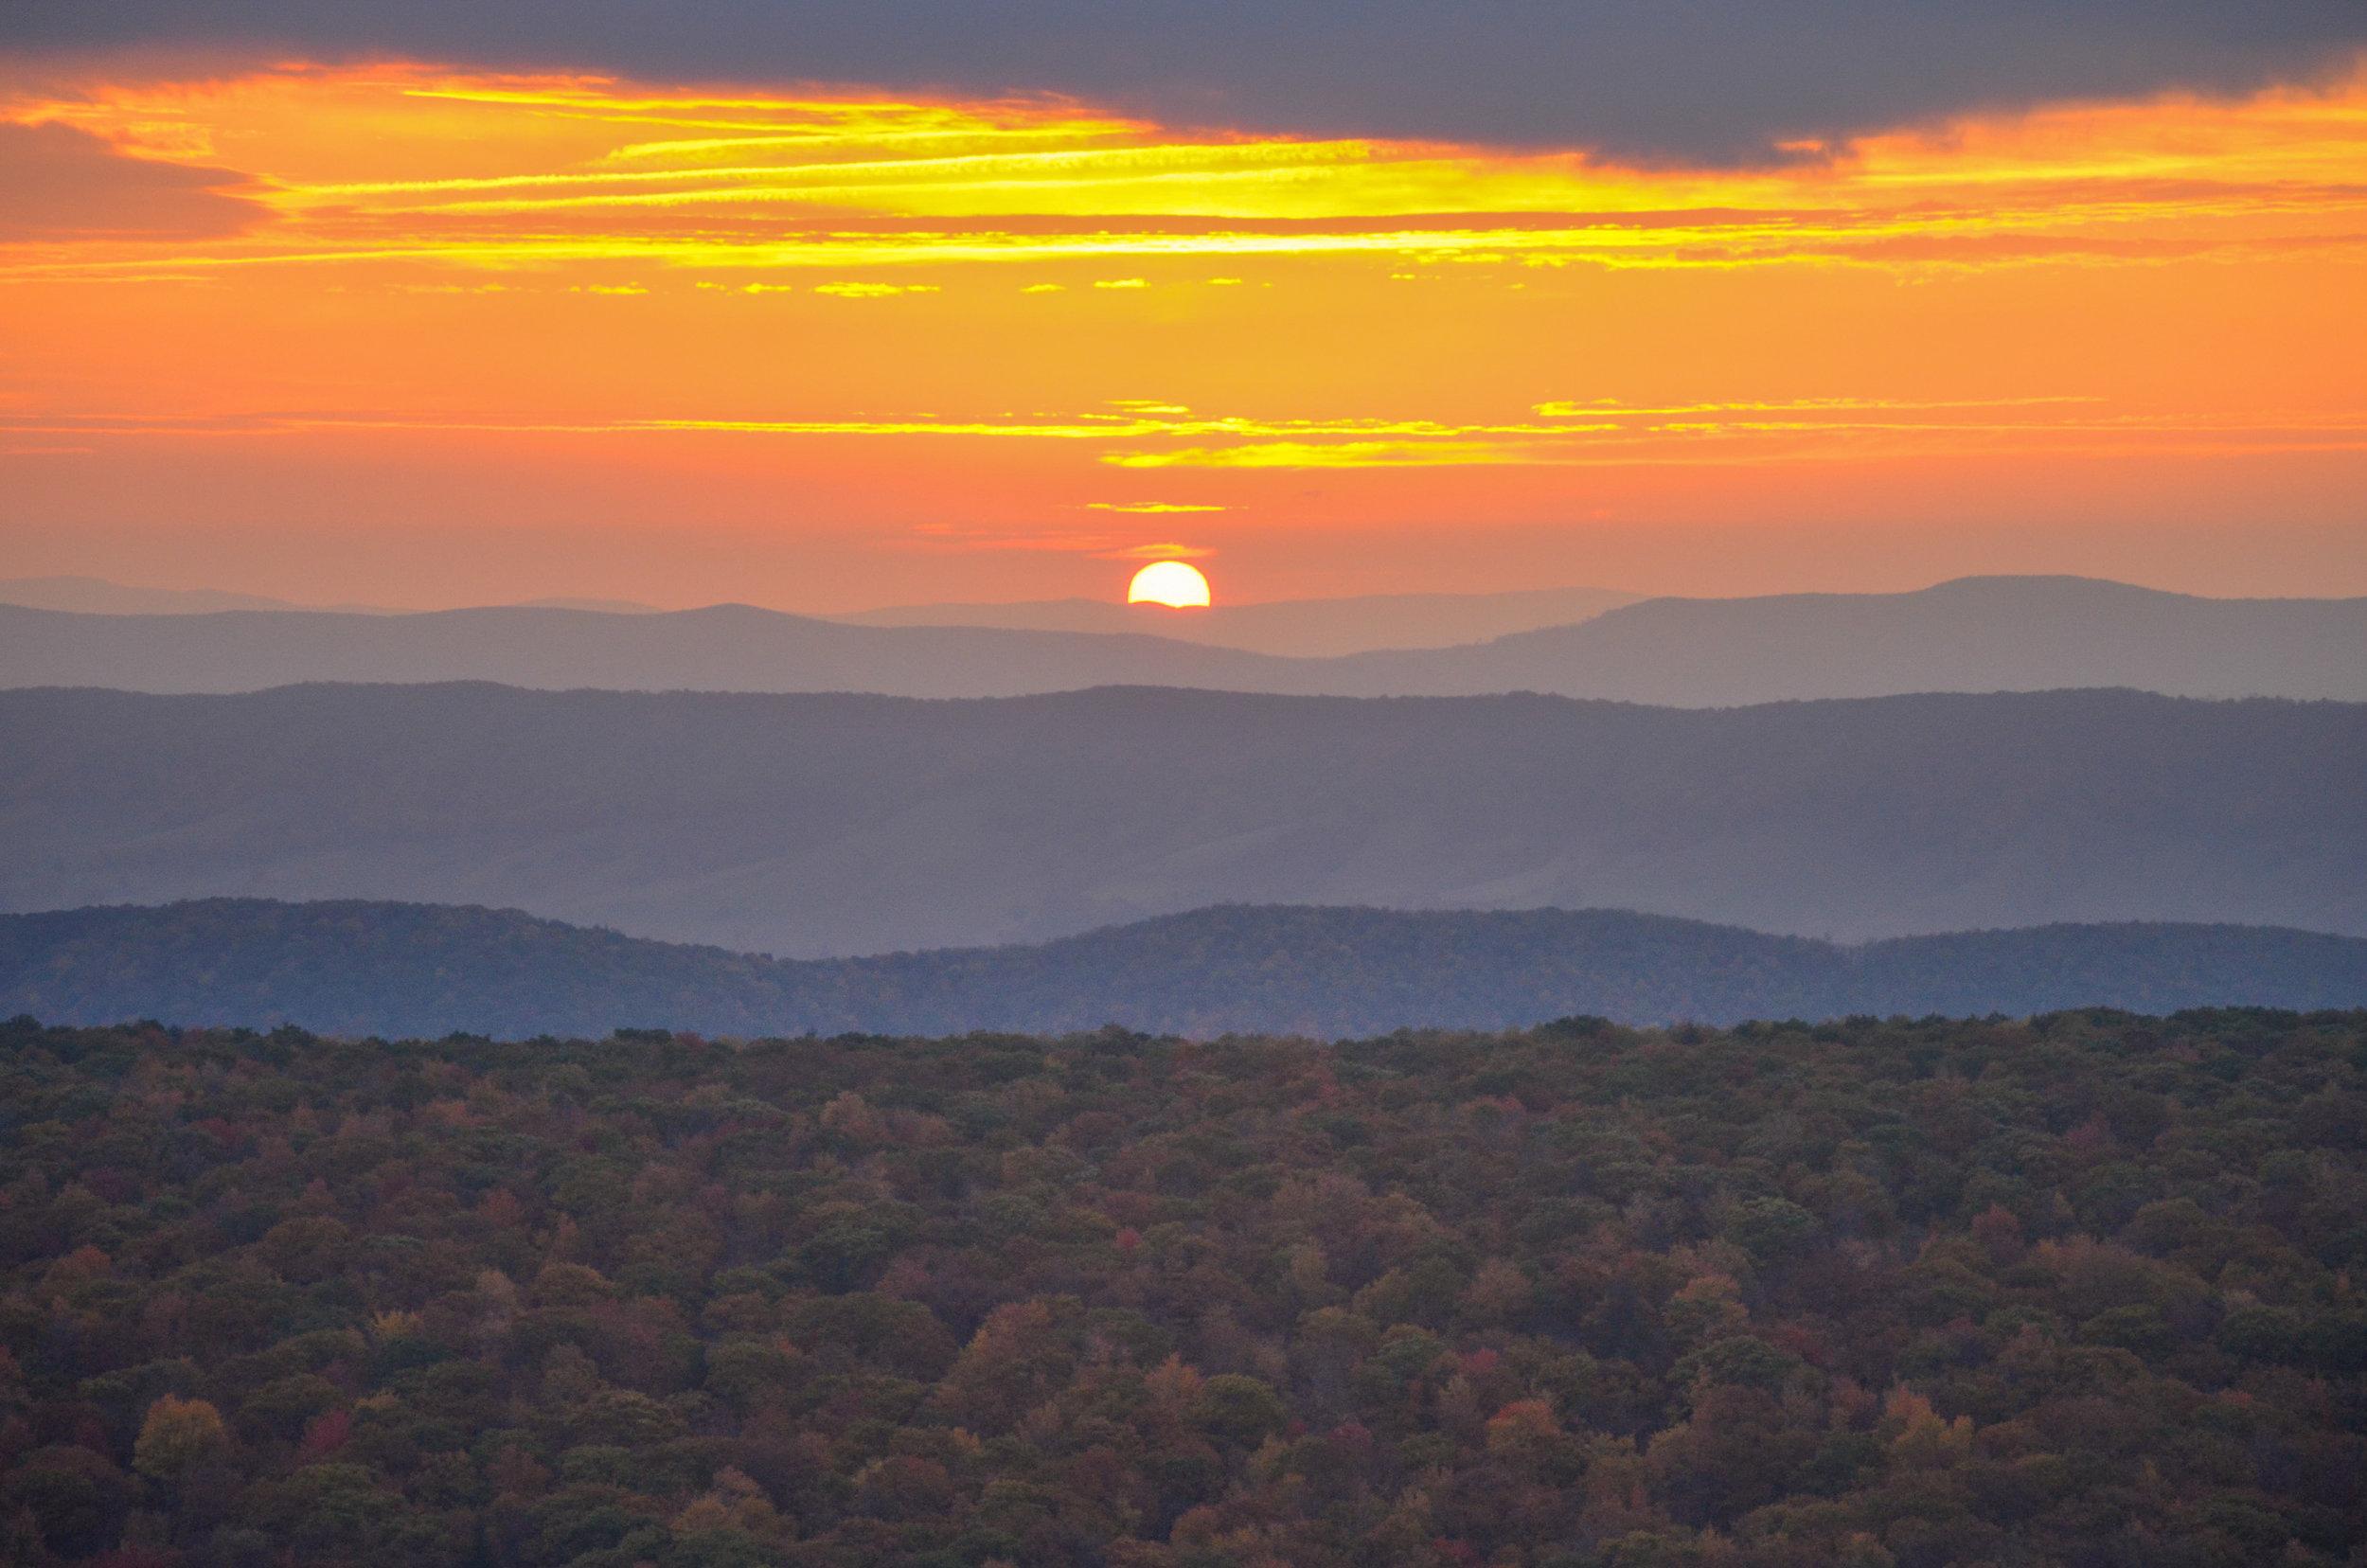 sunrise-sunset-fall-autumn-highland county-virginia.jpg